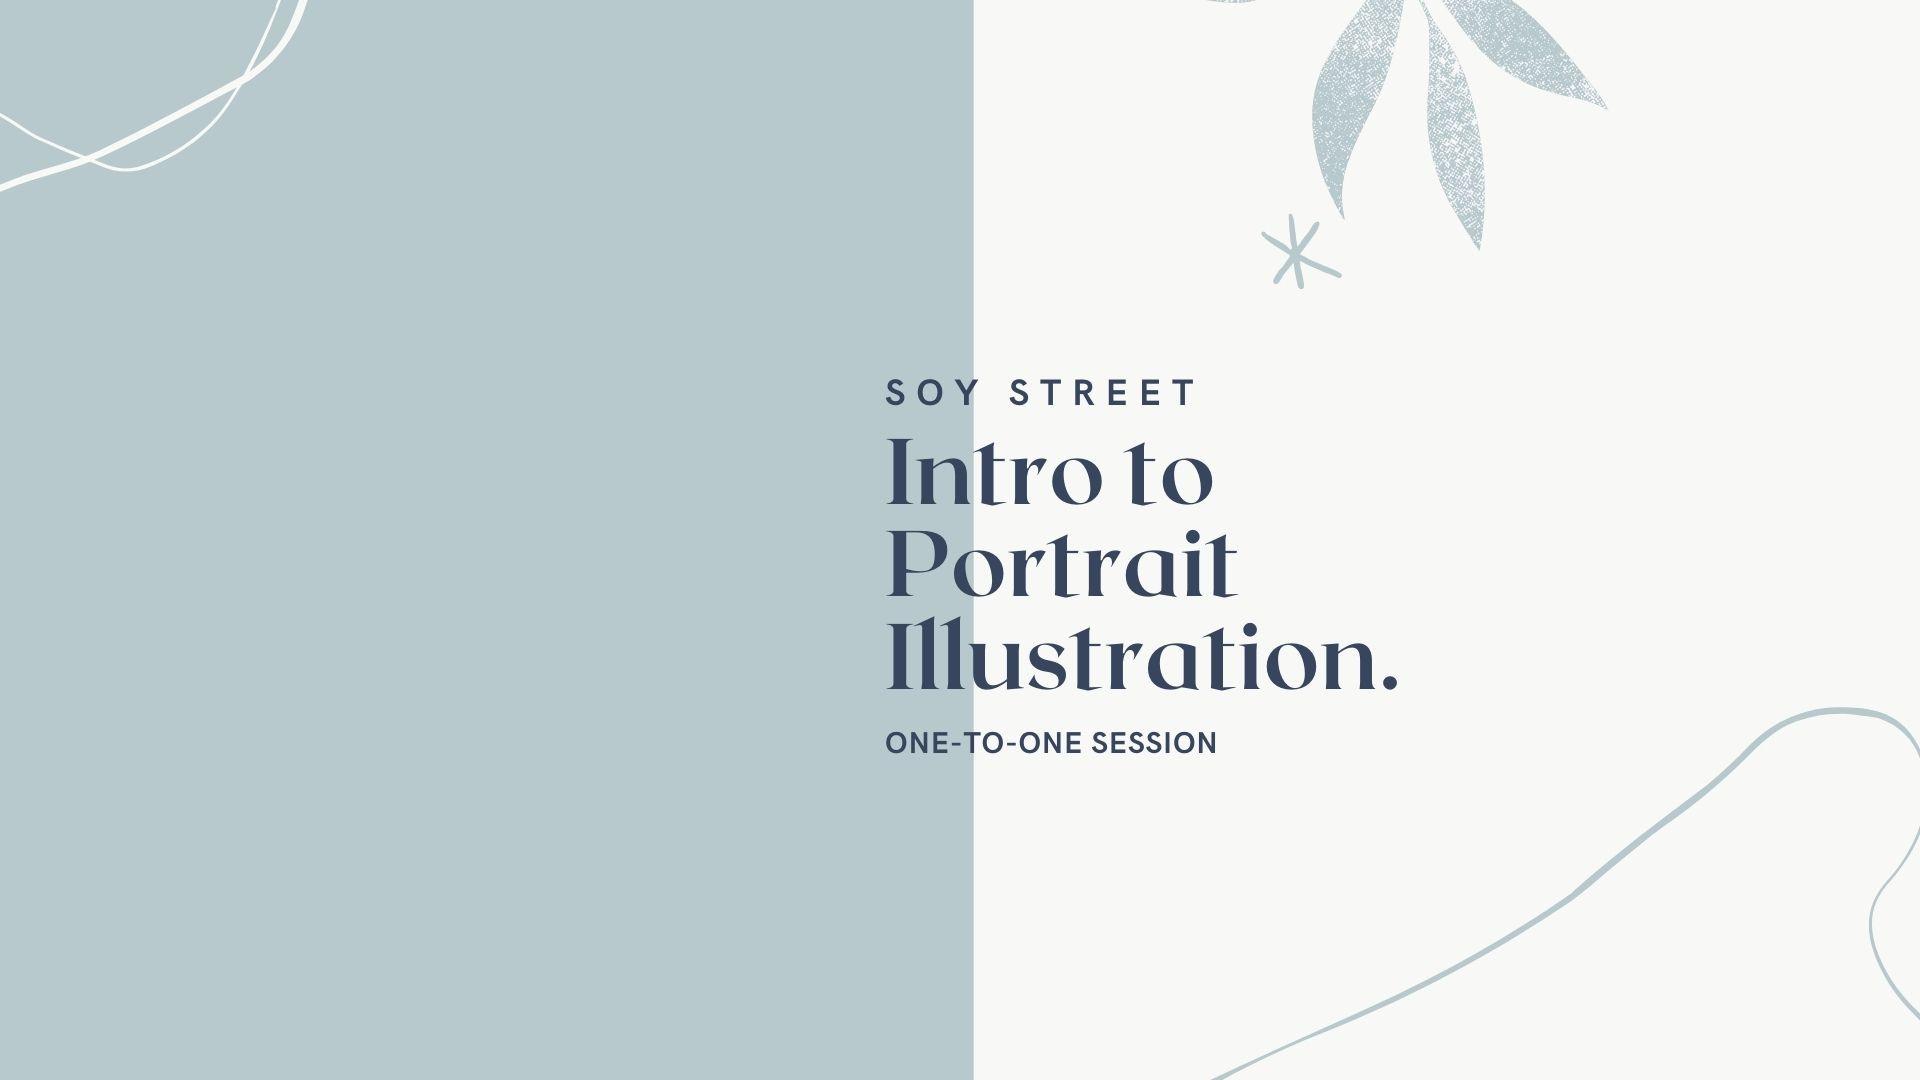 Intro to Portrait Illustration